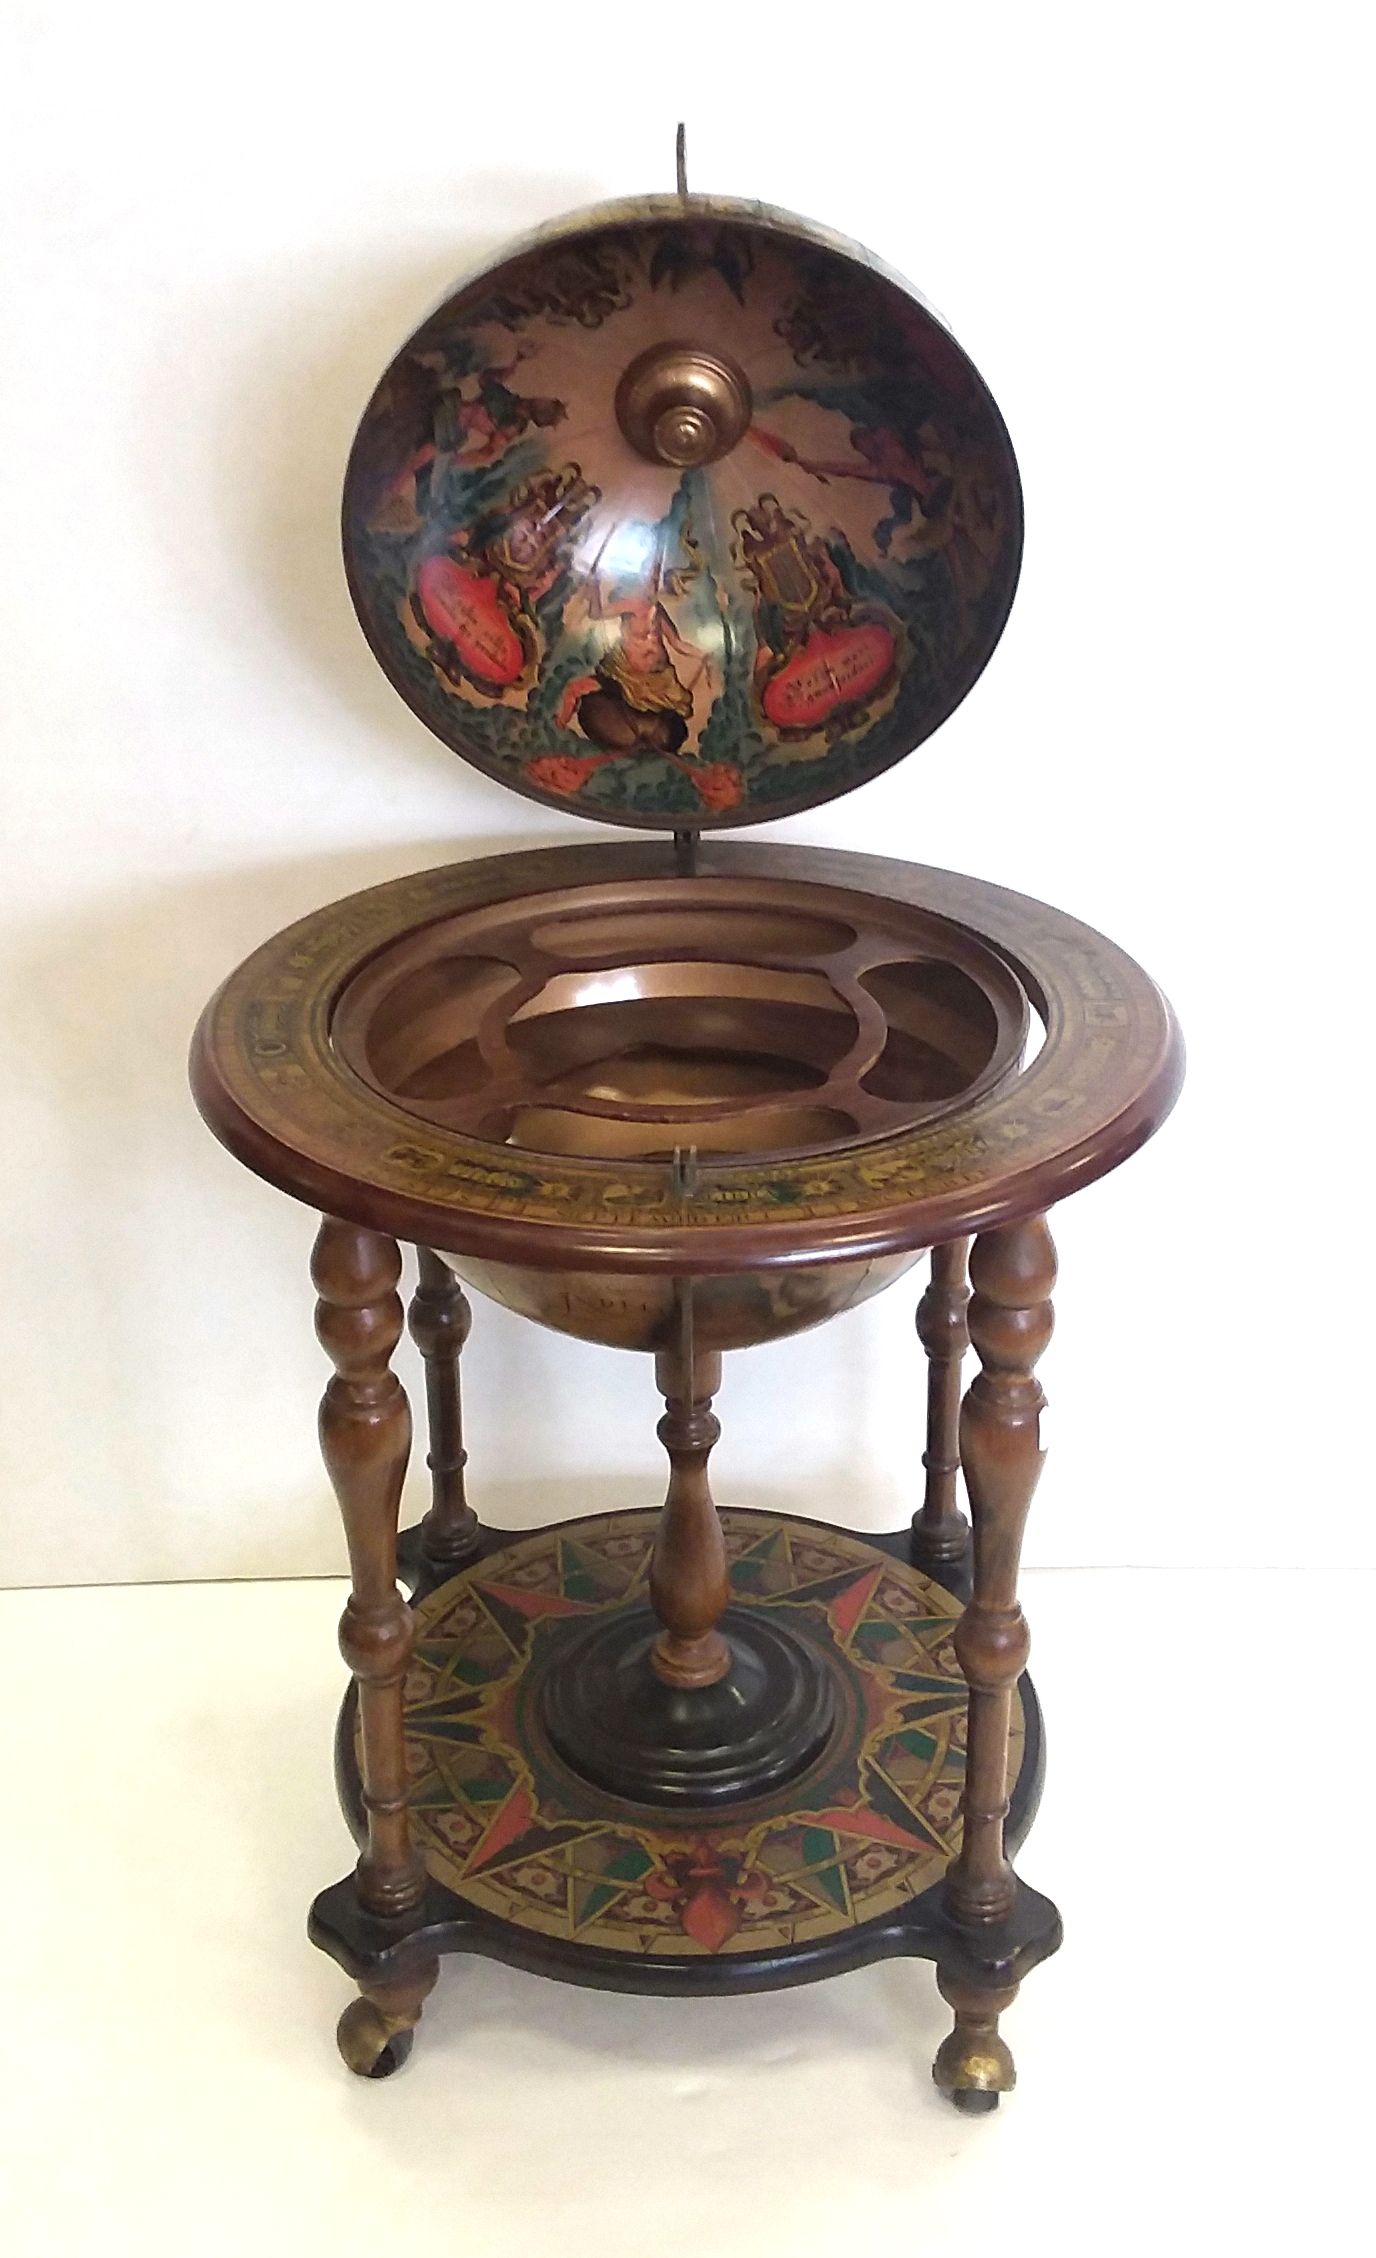 Vintage Globe Drinks Cabinet - Vintage Globe Drinks Cabinet – Reilly Antiques